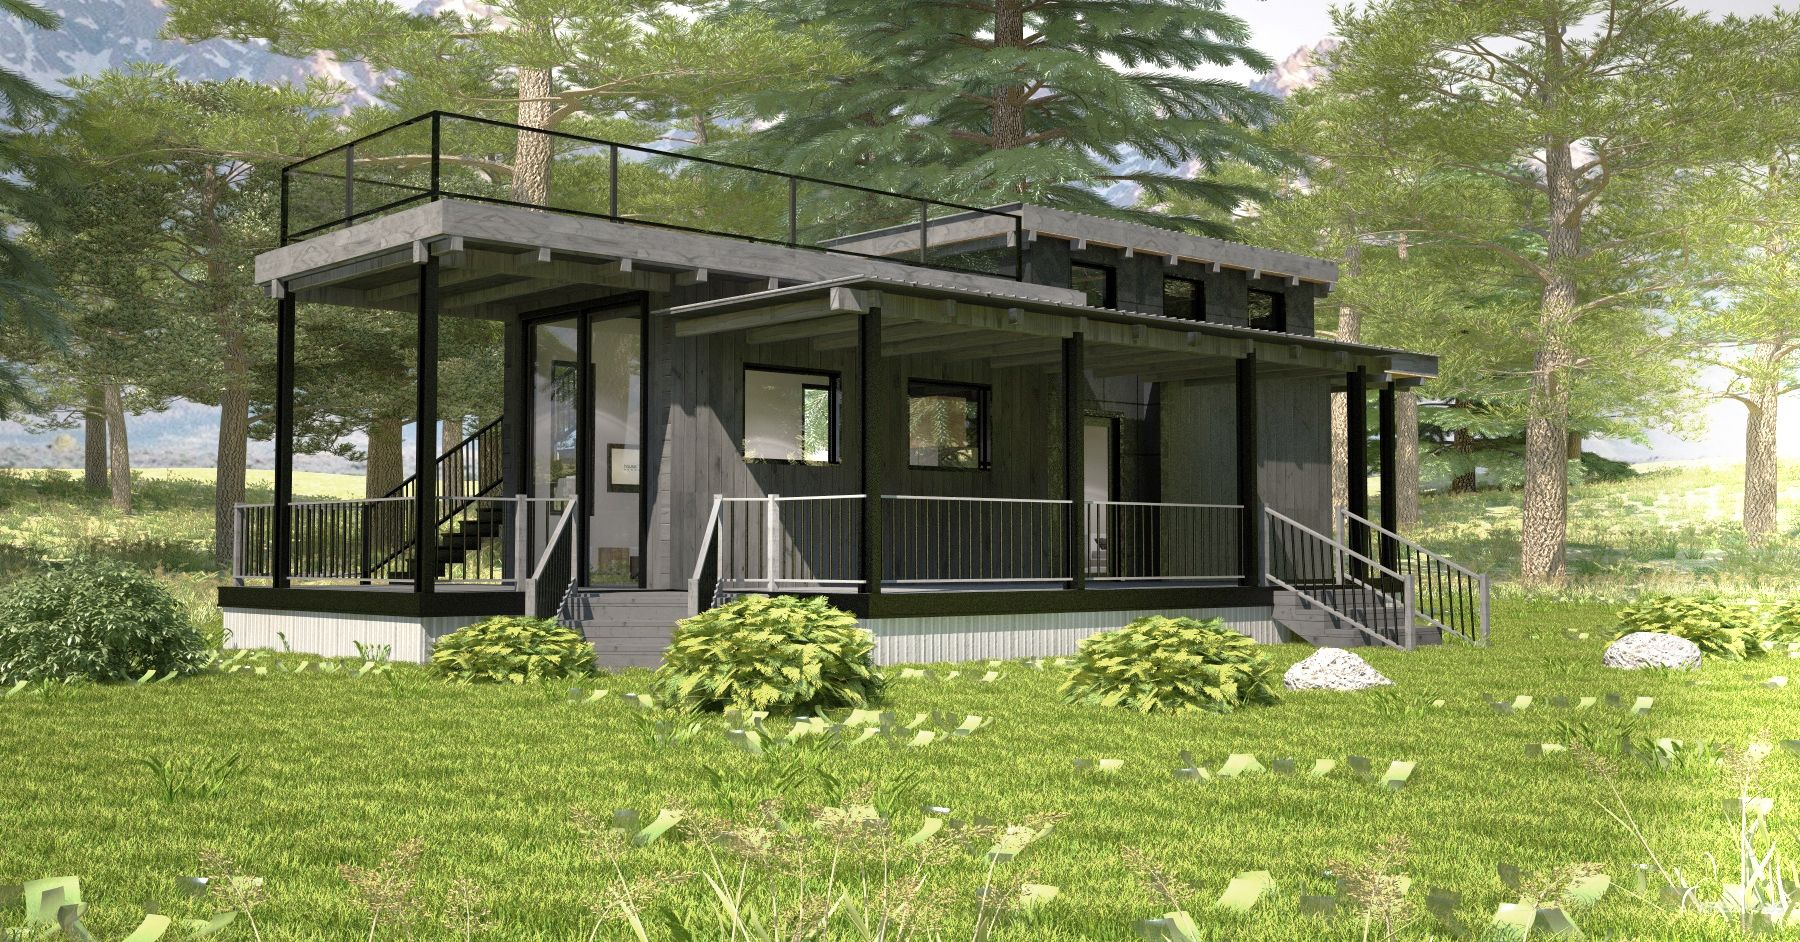 Flat Roof Caboose Wheelhaus Flat Roof House Modern Tiny House Flat Roof